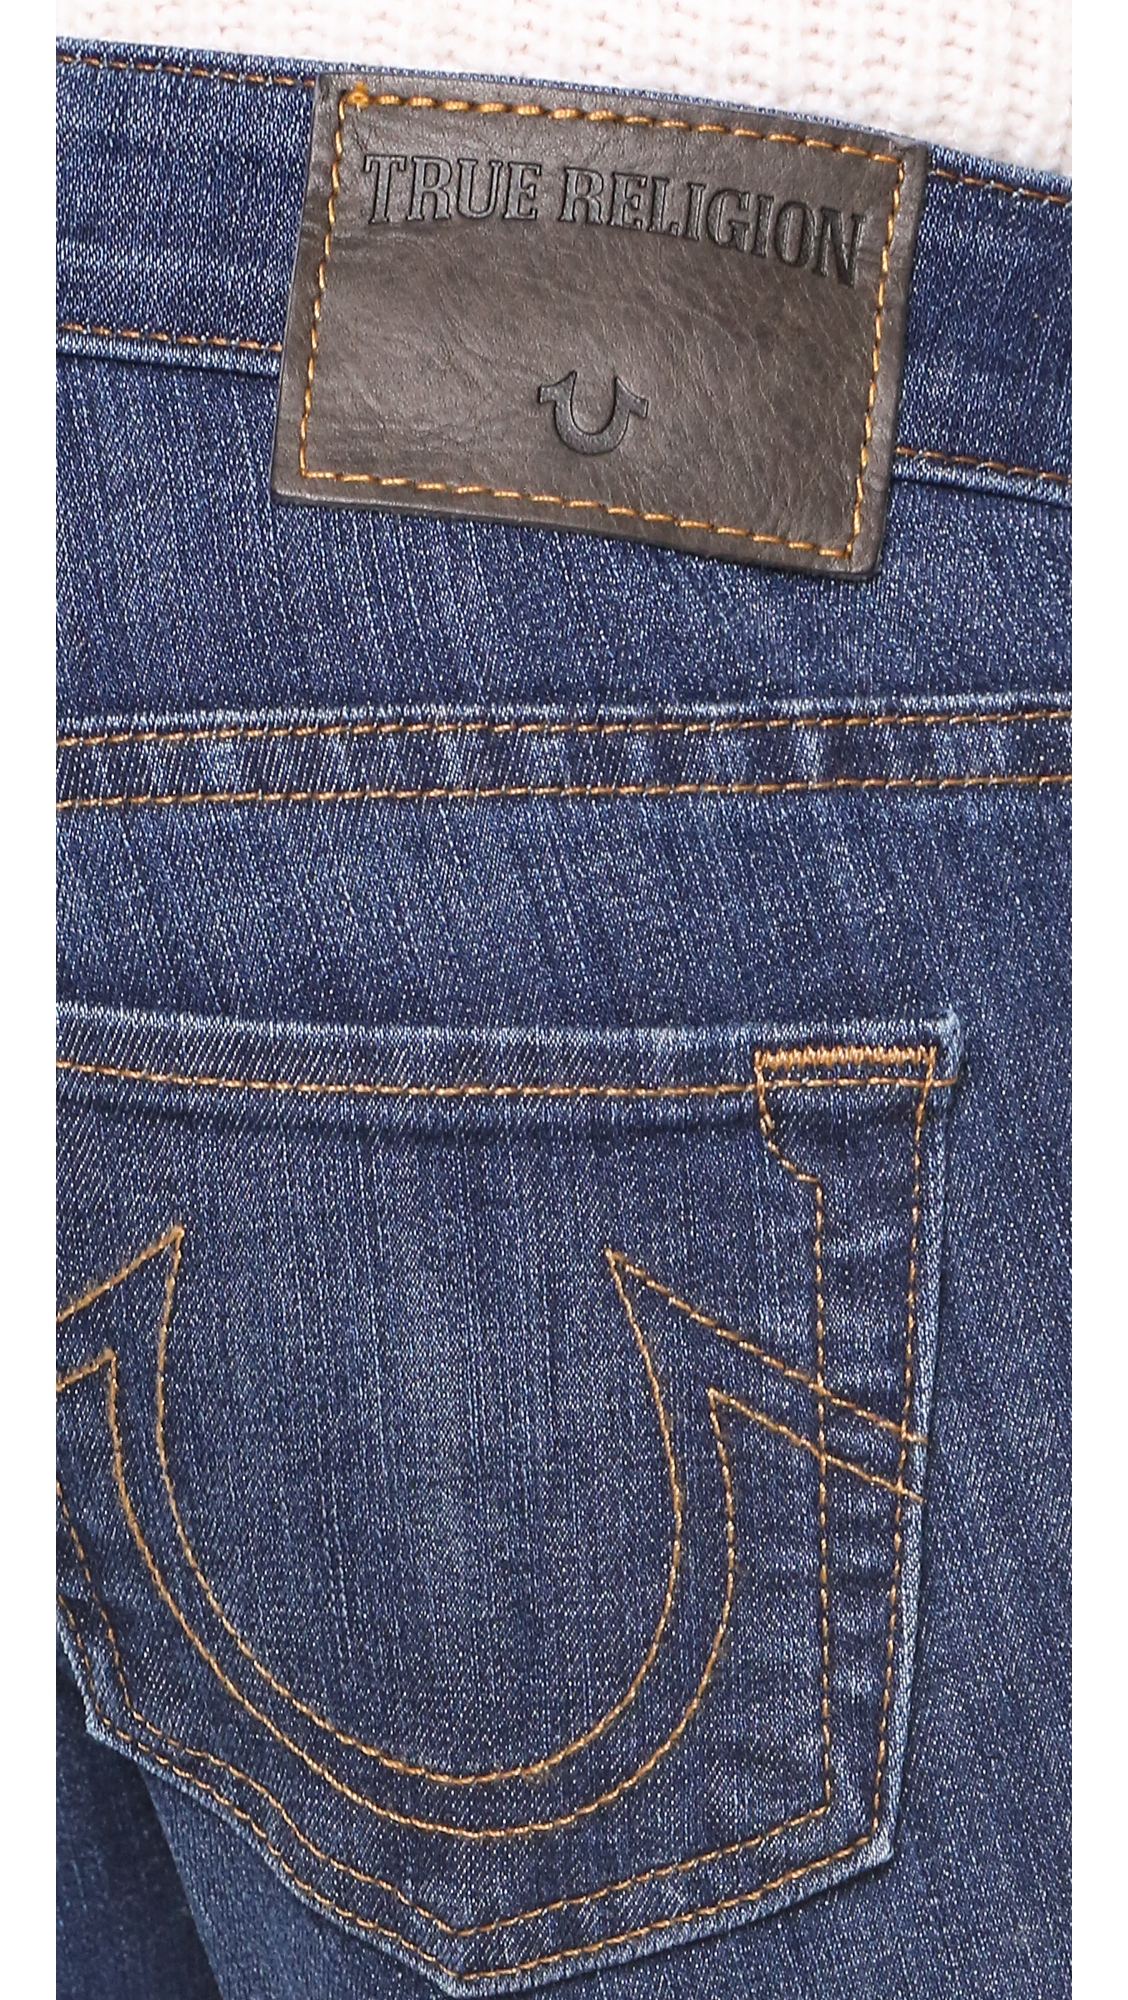 True Religion Karlie Bell Bottom Jeans in Blue